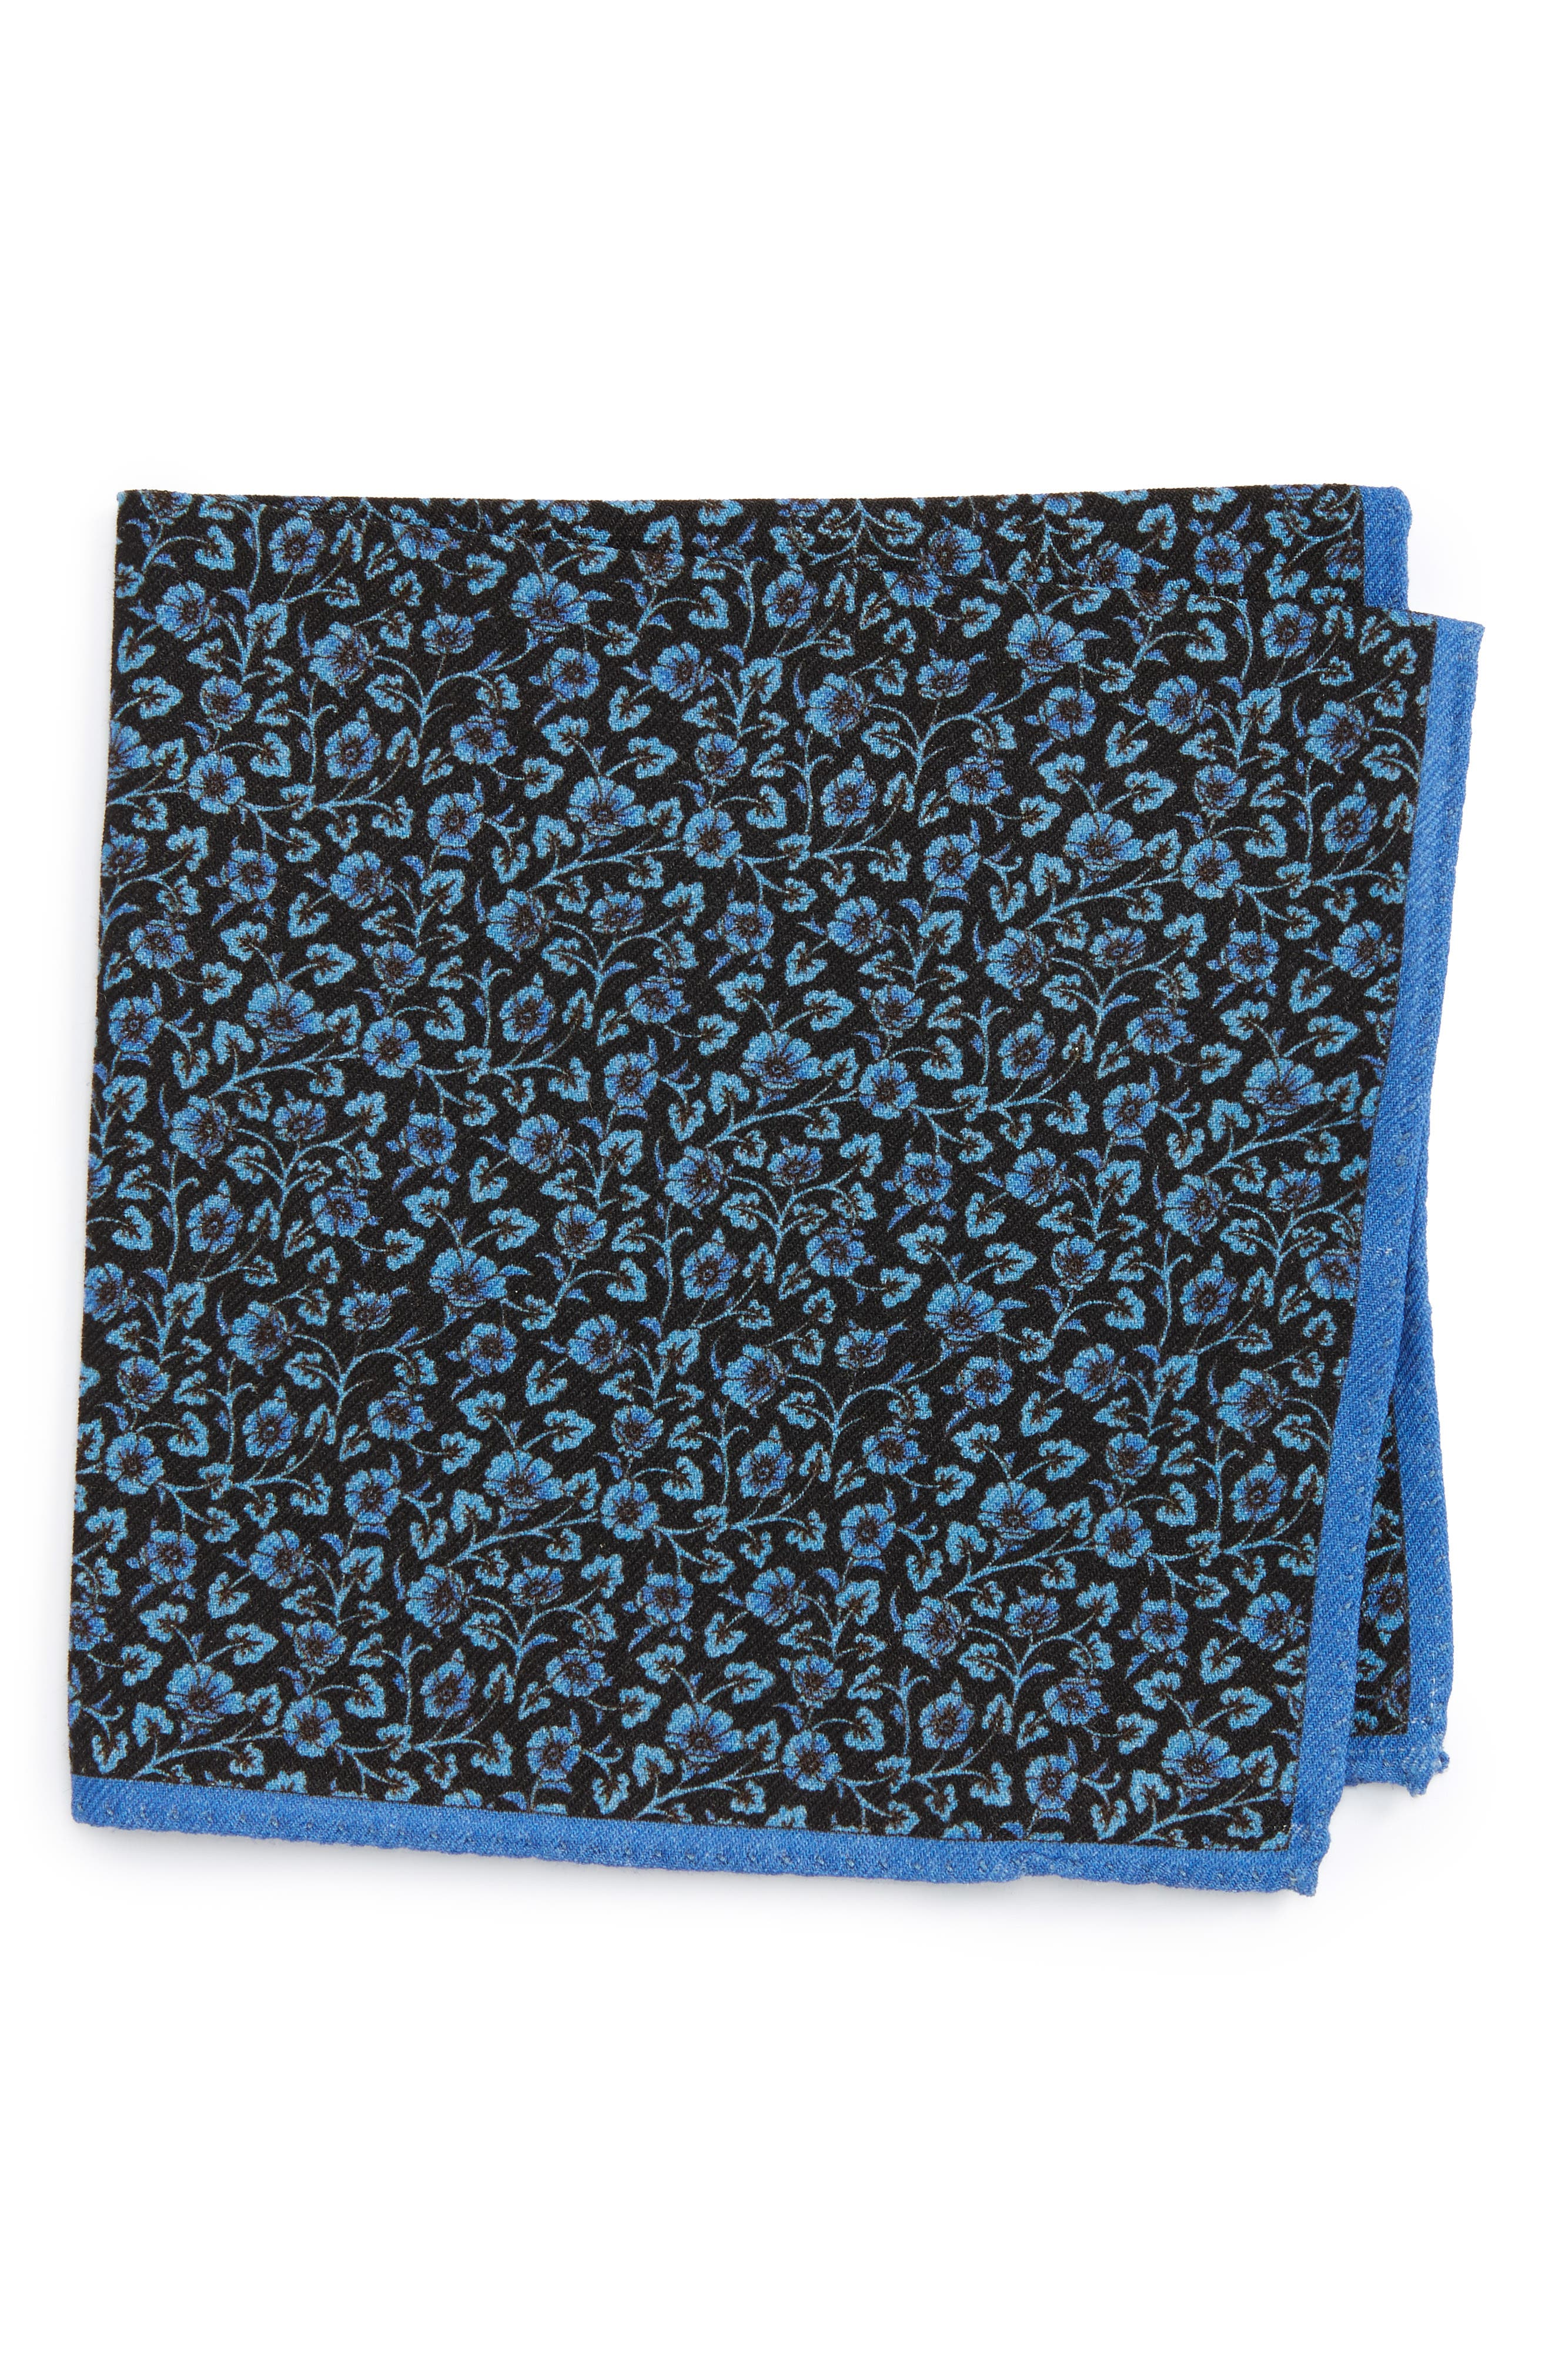 Alternate Image 1 Selected - Ted Baker London Clover Print Wool Pocket Square